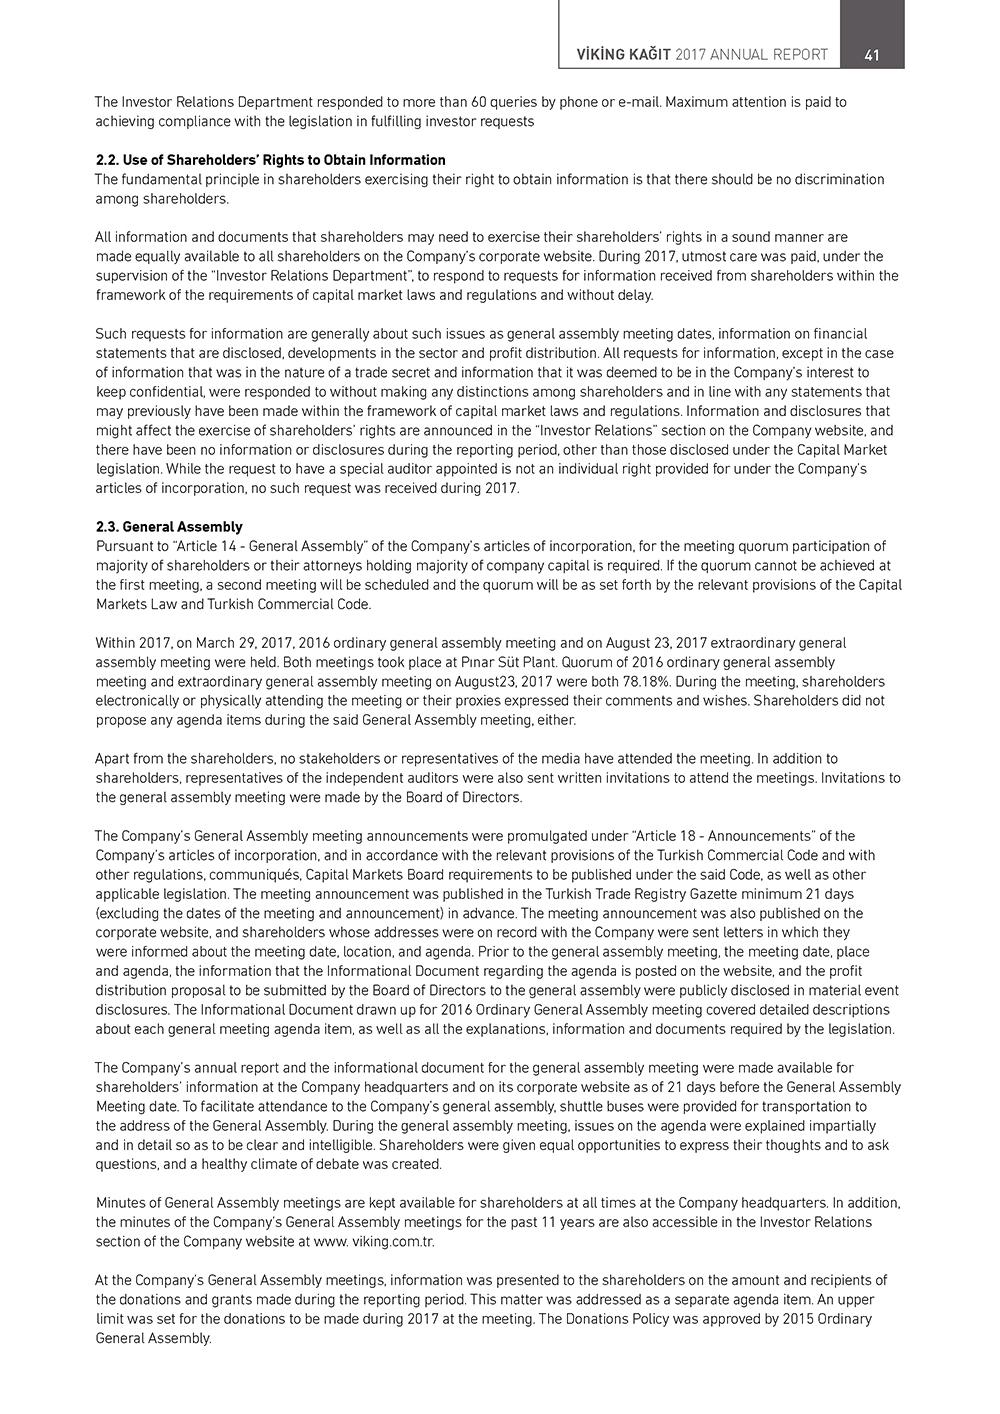 Corporate Governance Principles Compliance Report – Viking Kağıt